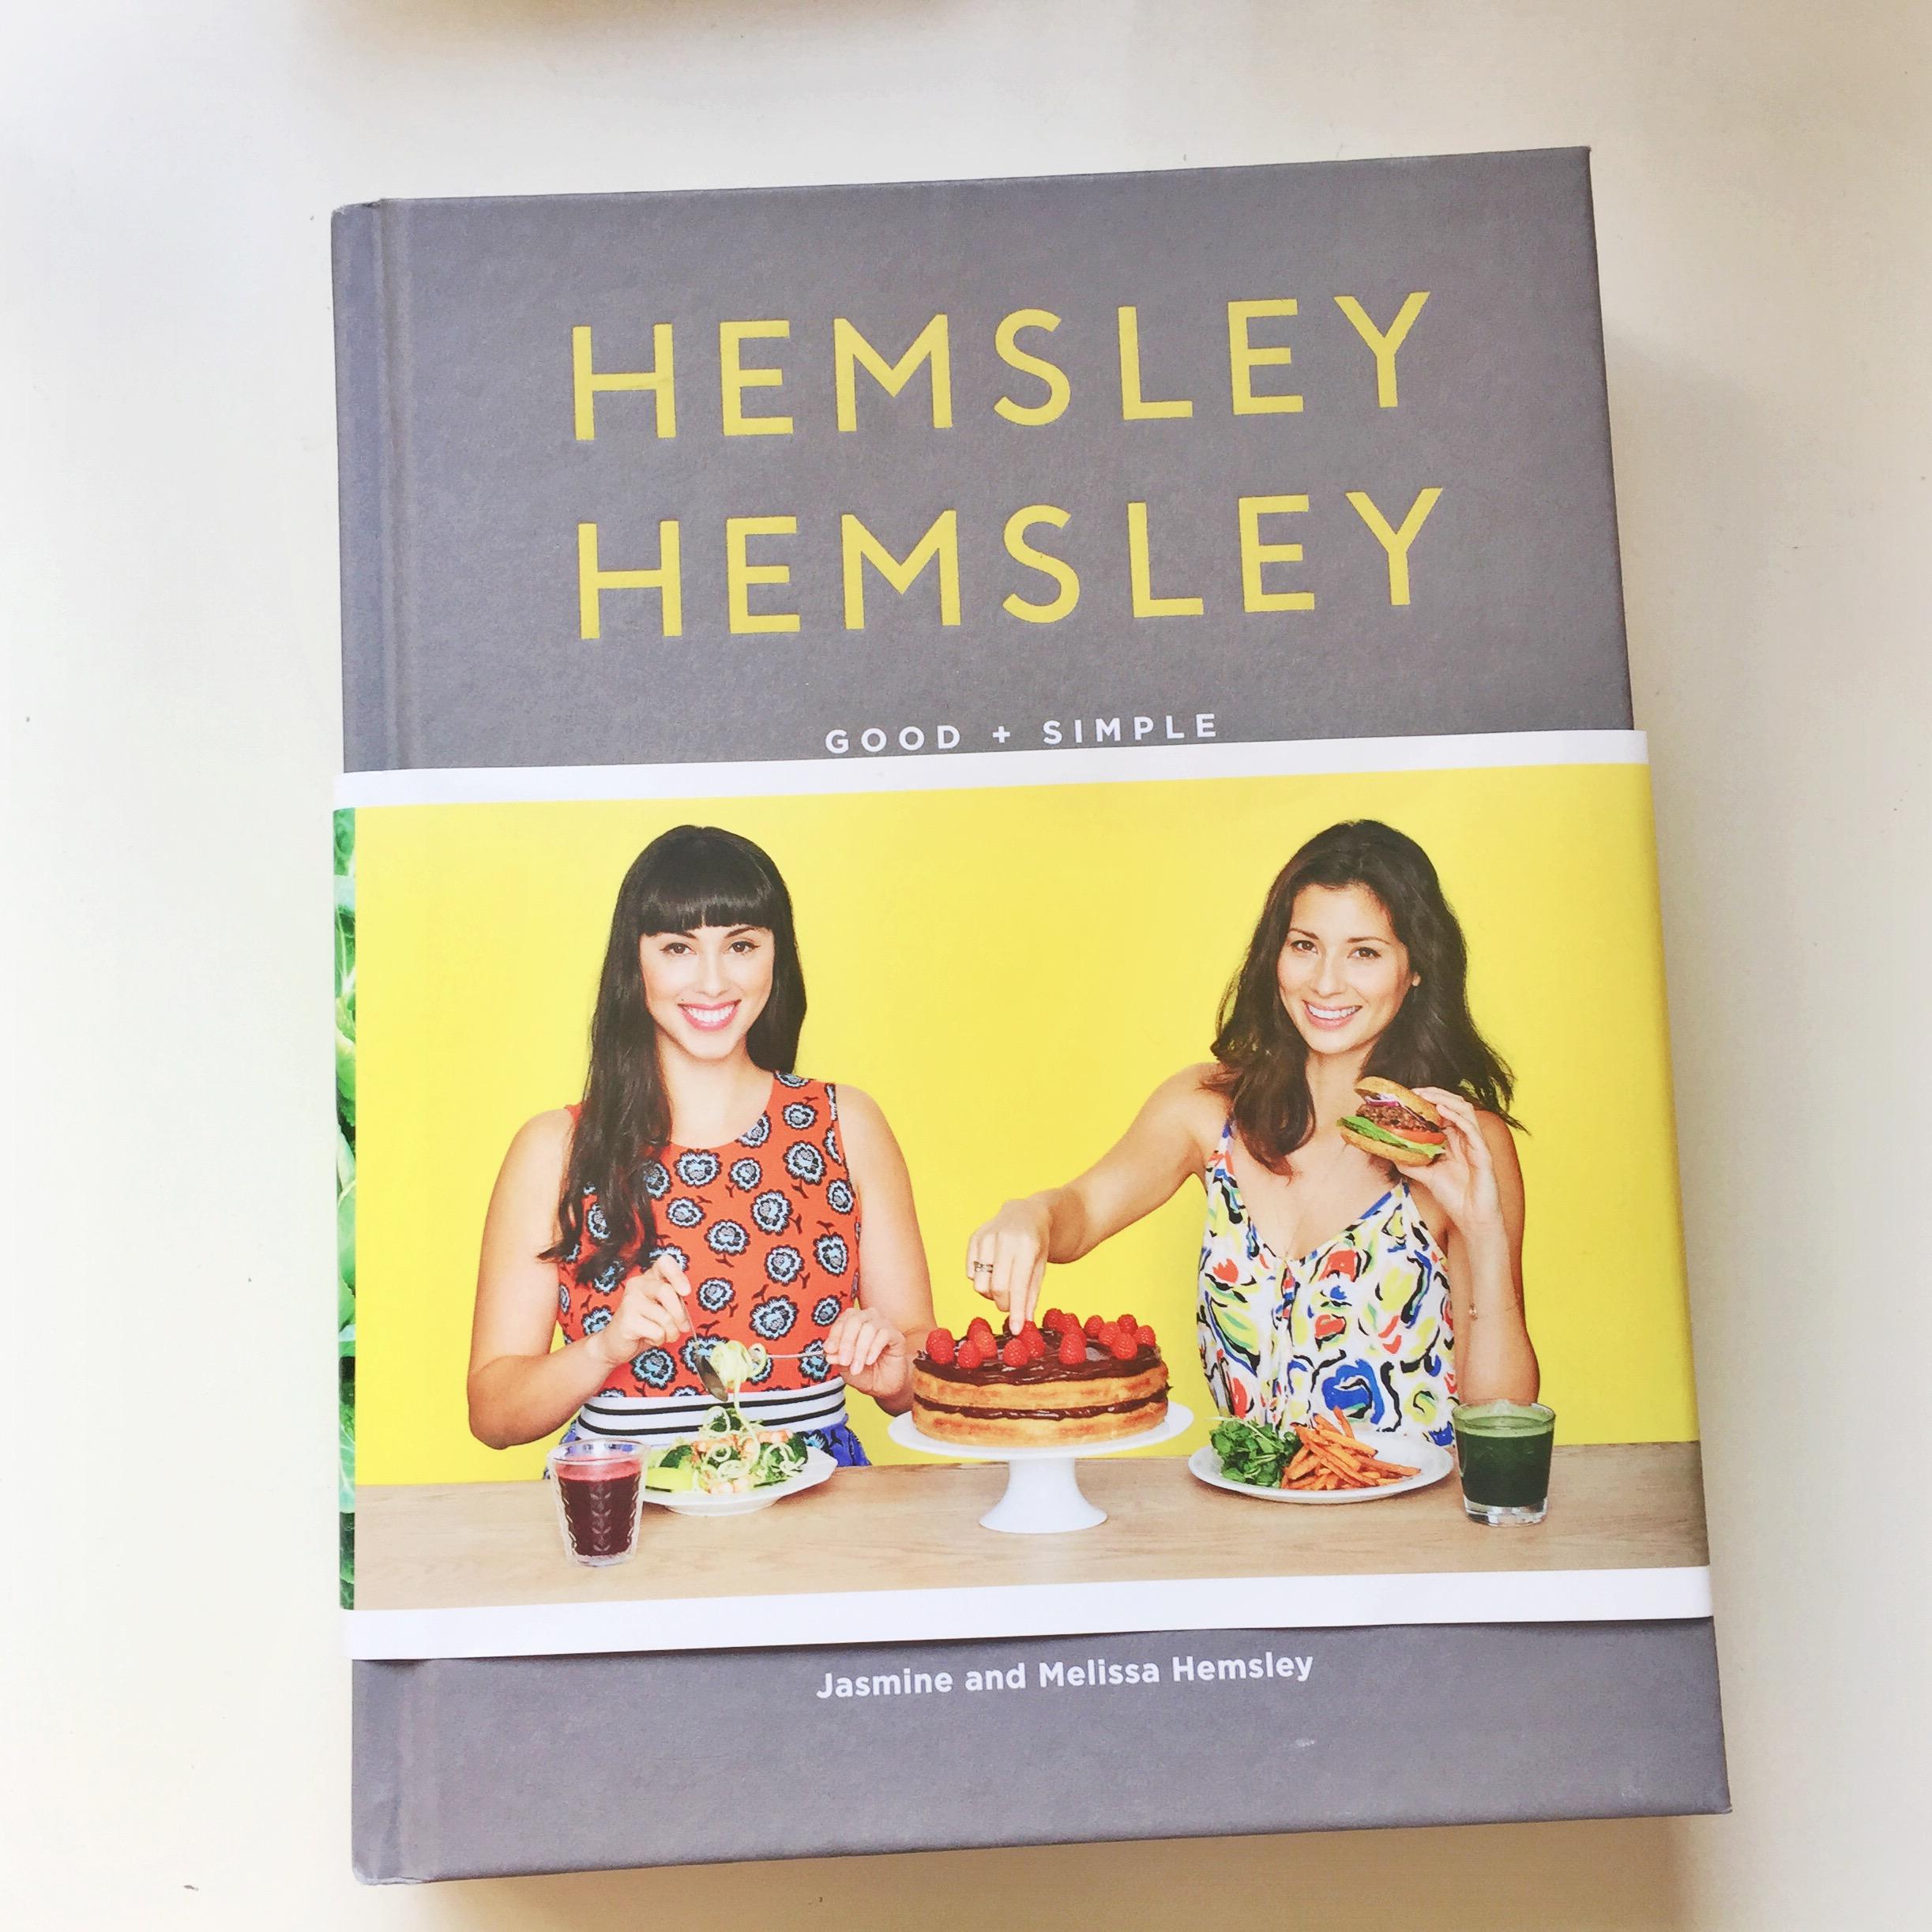 Good and simple hemsley hemsley